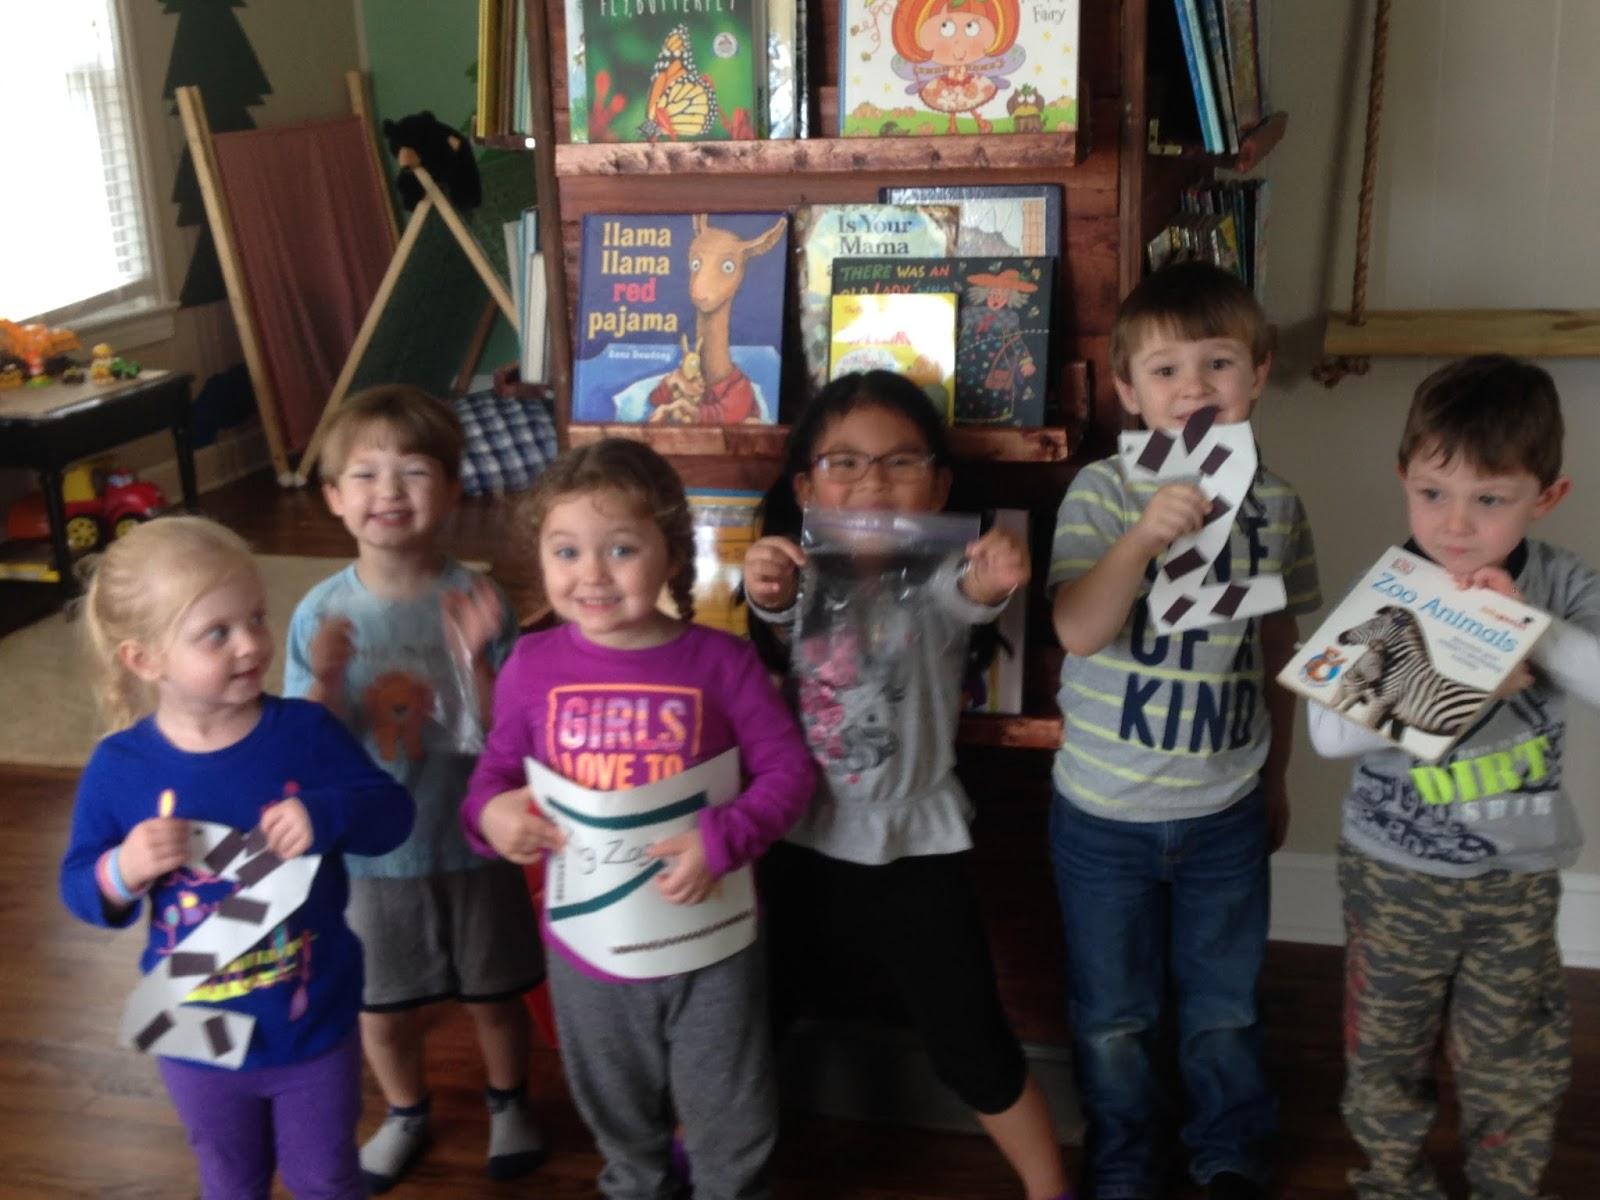 Dyersburg Preschool Show & Tell Yesterday At This Dyersburg Preschool